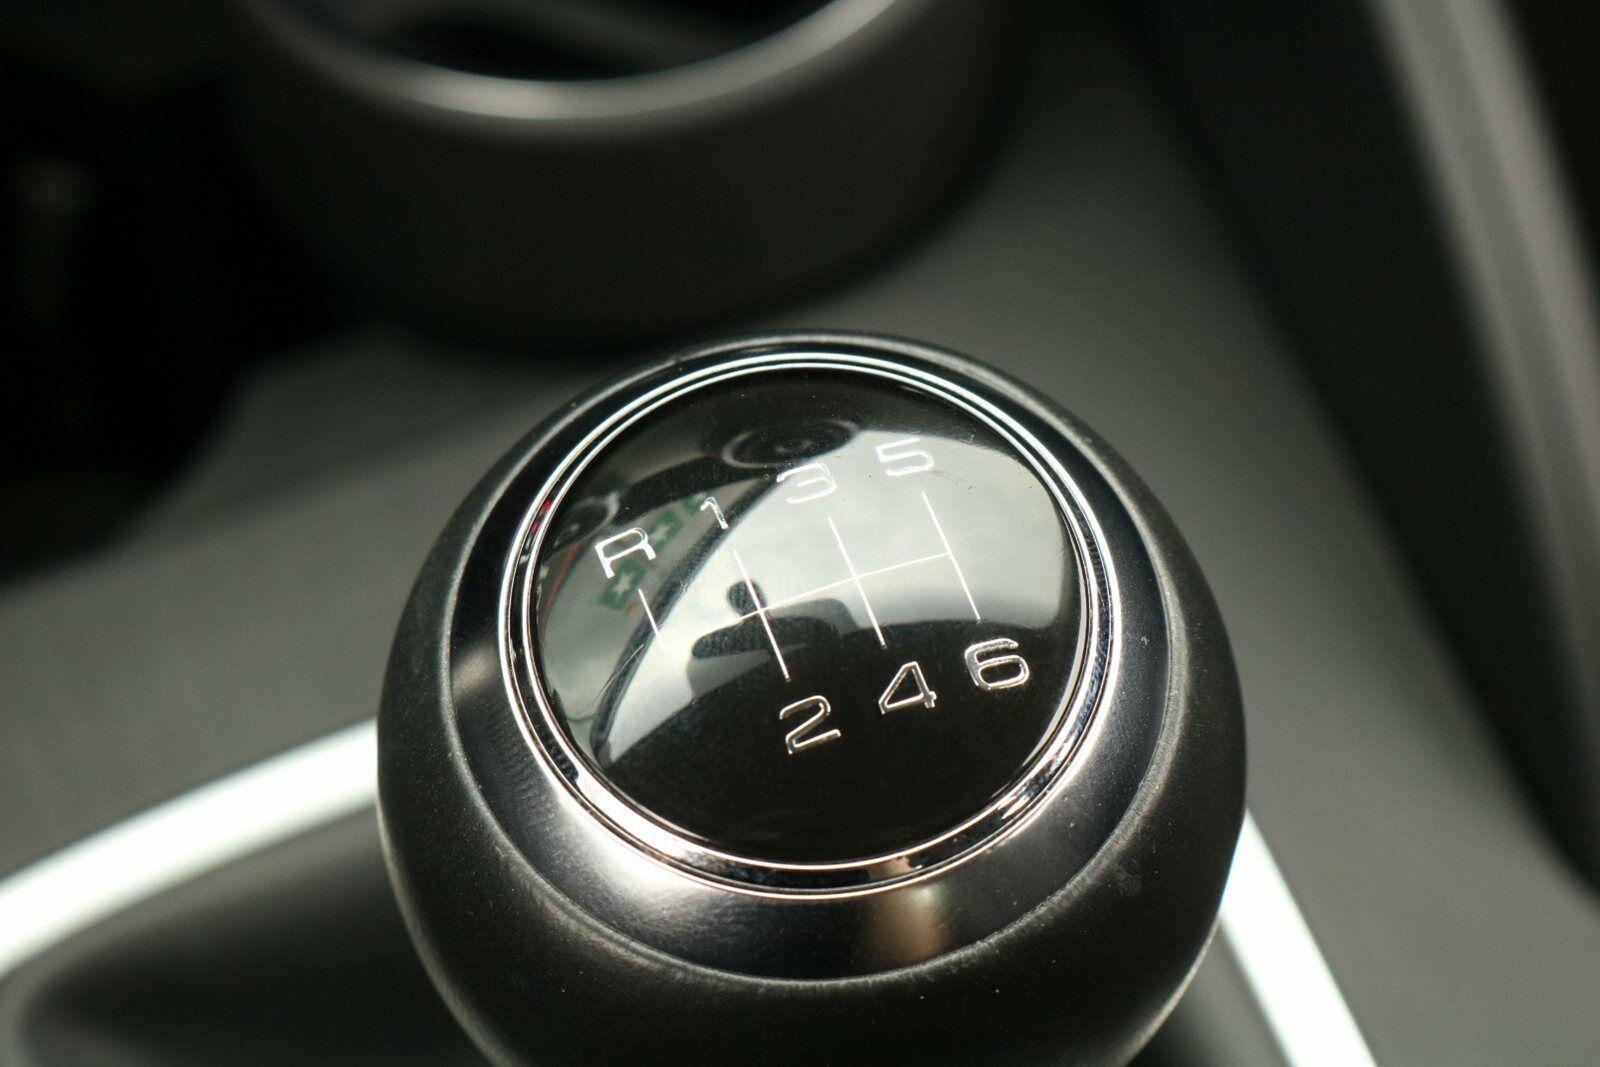 Audi A3 TFSi 125 Ambition SB